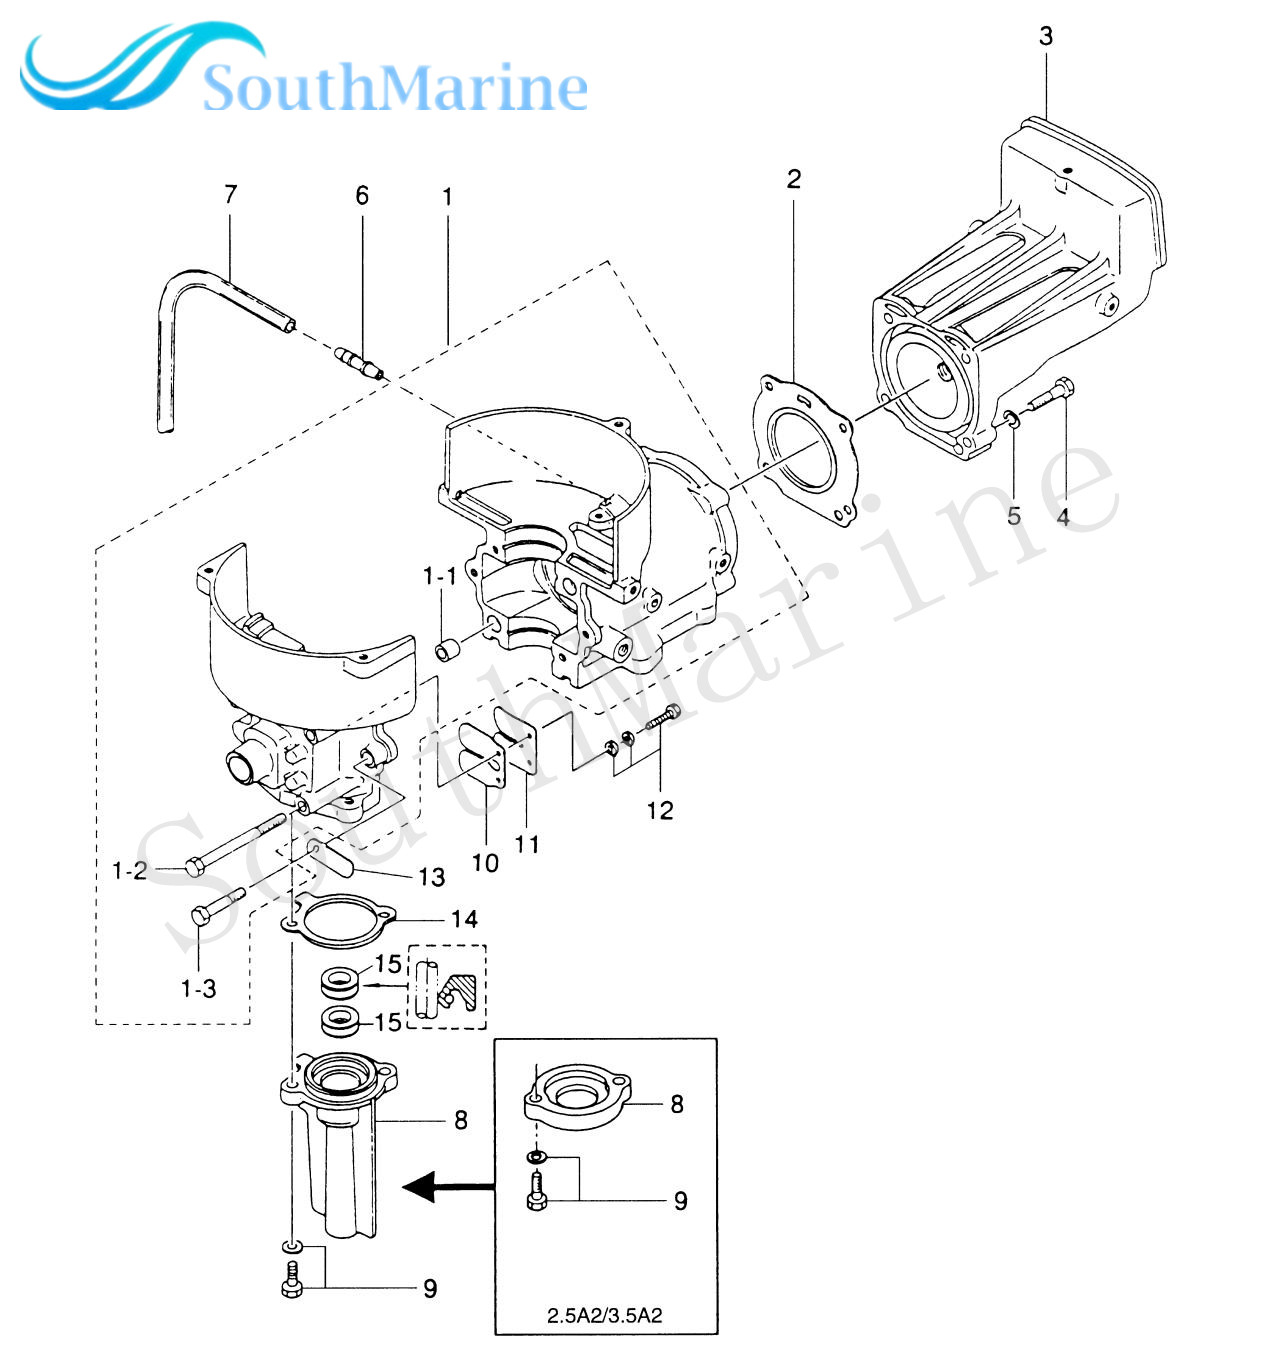 Tohatsu 6hp Parts Diagram House Wiring Diagram Symbols \u2022 Honda  Outboard Wiring Diagram Tohatsu 30 Hp Outboard Wiring Diagram